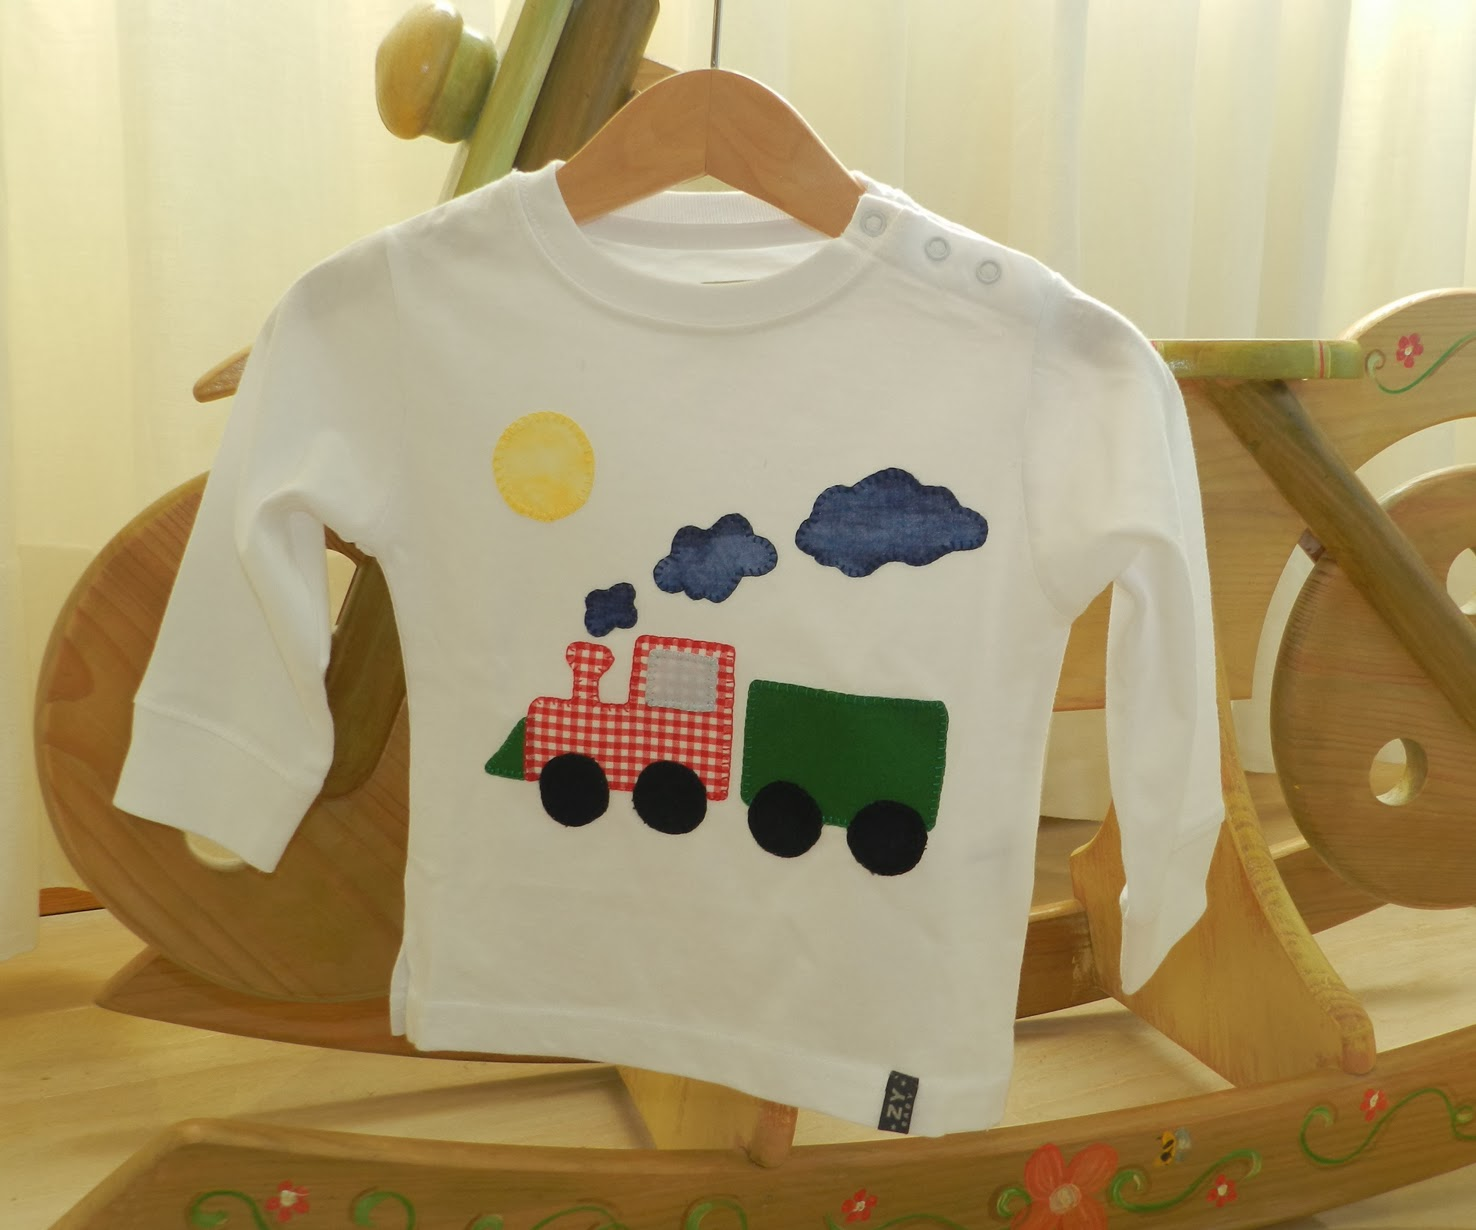 camisetas,, camiseta, camisetas niños, camiseta patchwork, camisetas patchwork, camisetas patchwork niños, camiseta tren, tren, camiseta niño patchwork, aplicaciones, aplicaciones patchwork,